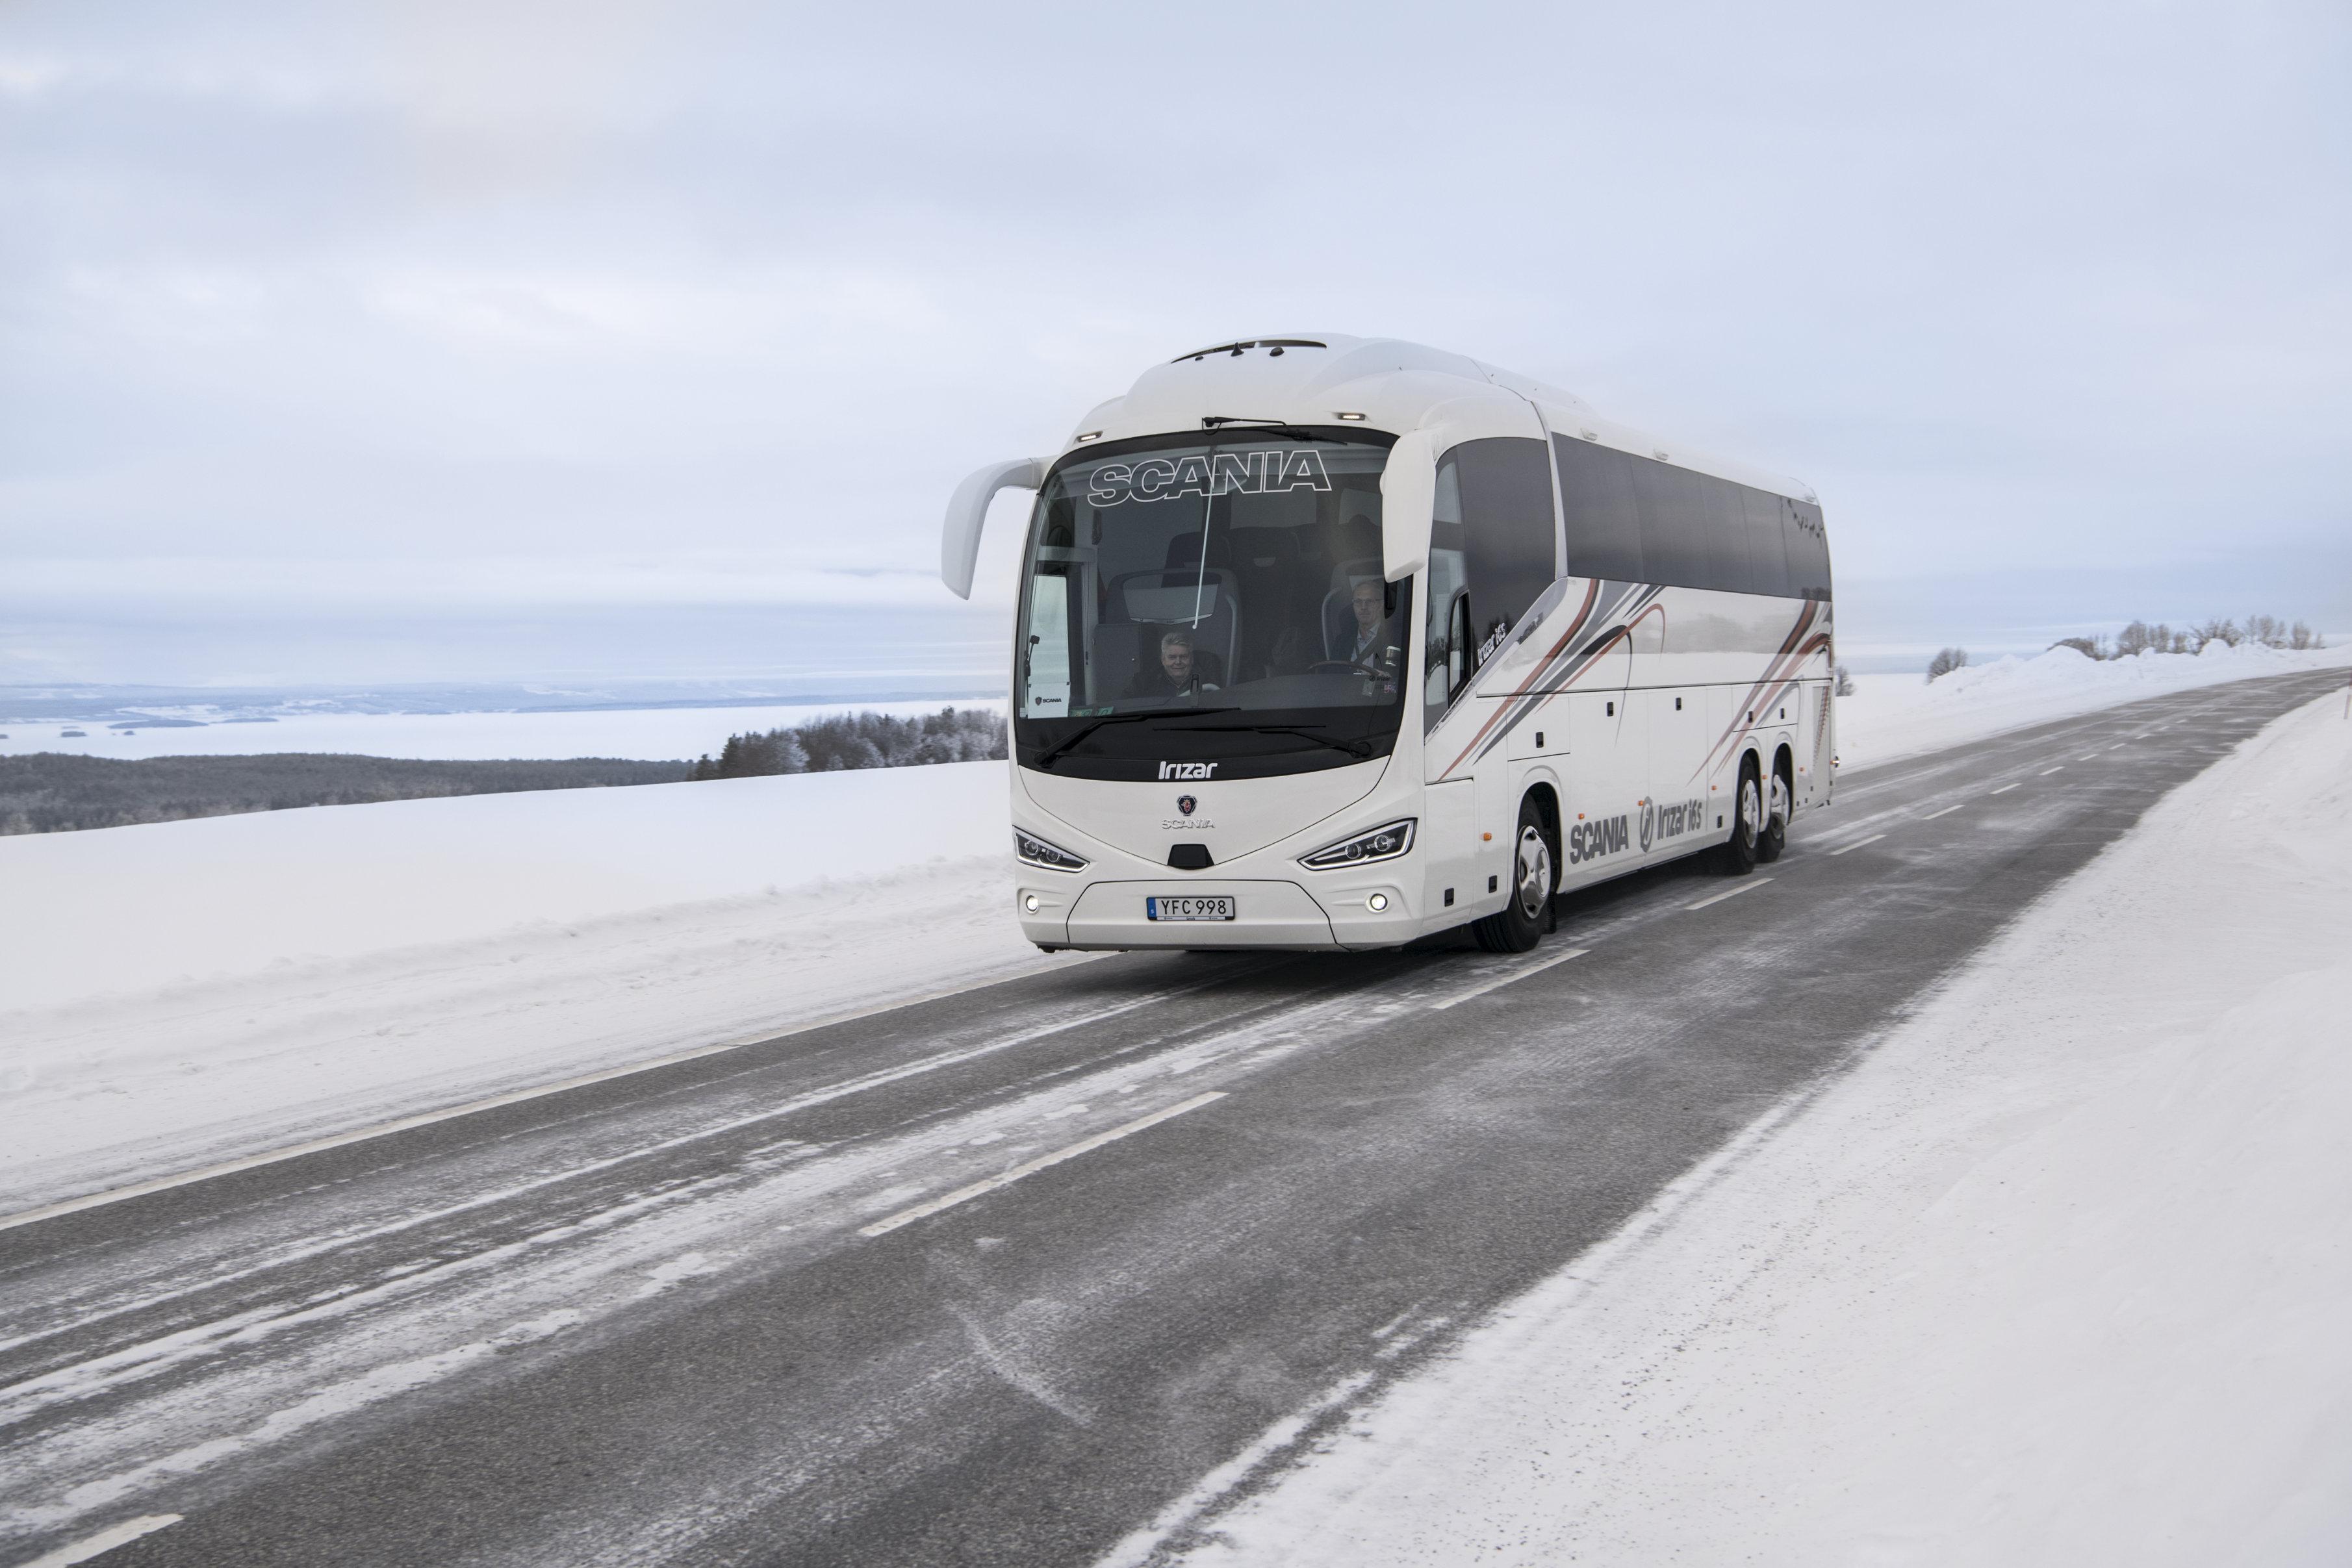 Scania-Irizari6-turistbuss